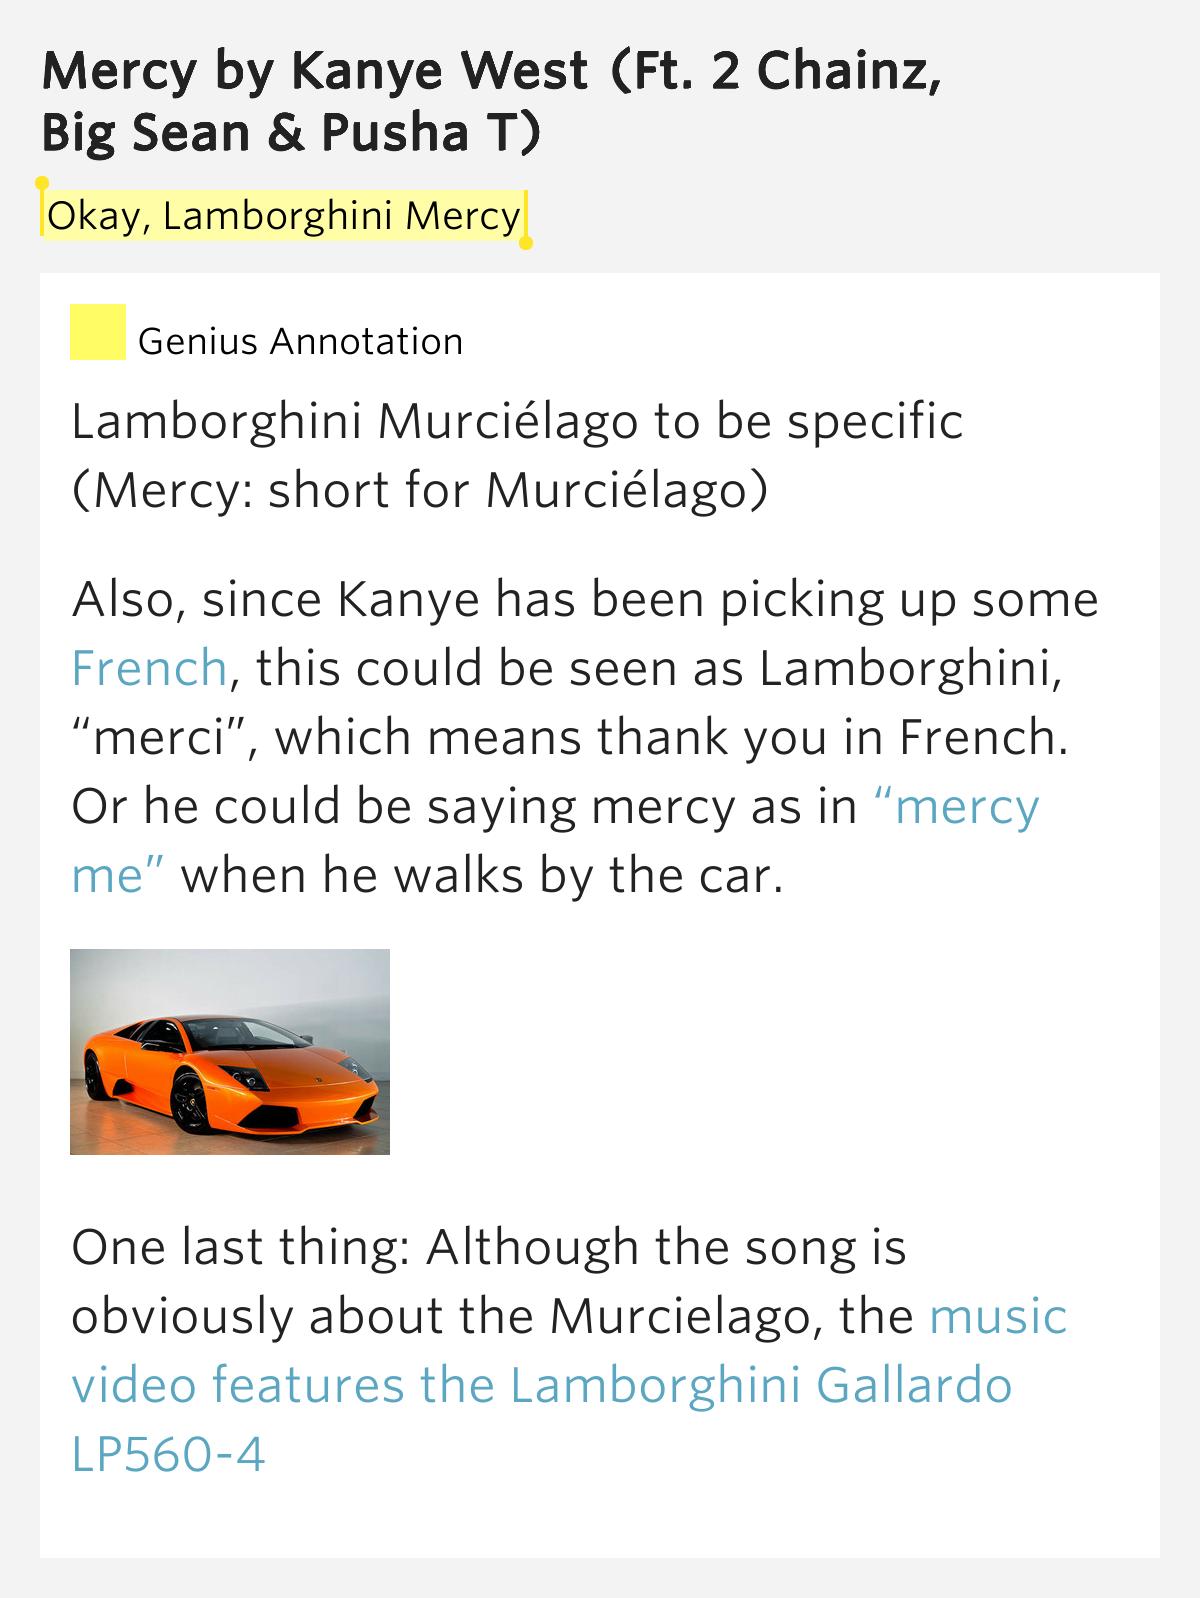 Okay Lamborghini Mercy Mercy Lyrics Meaning